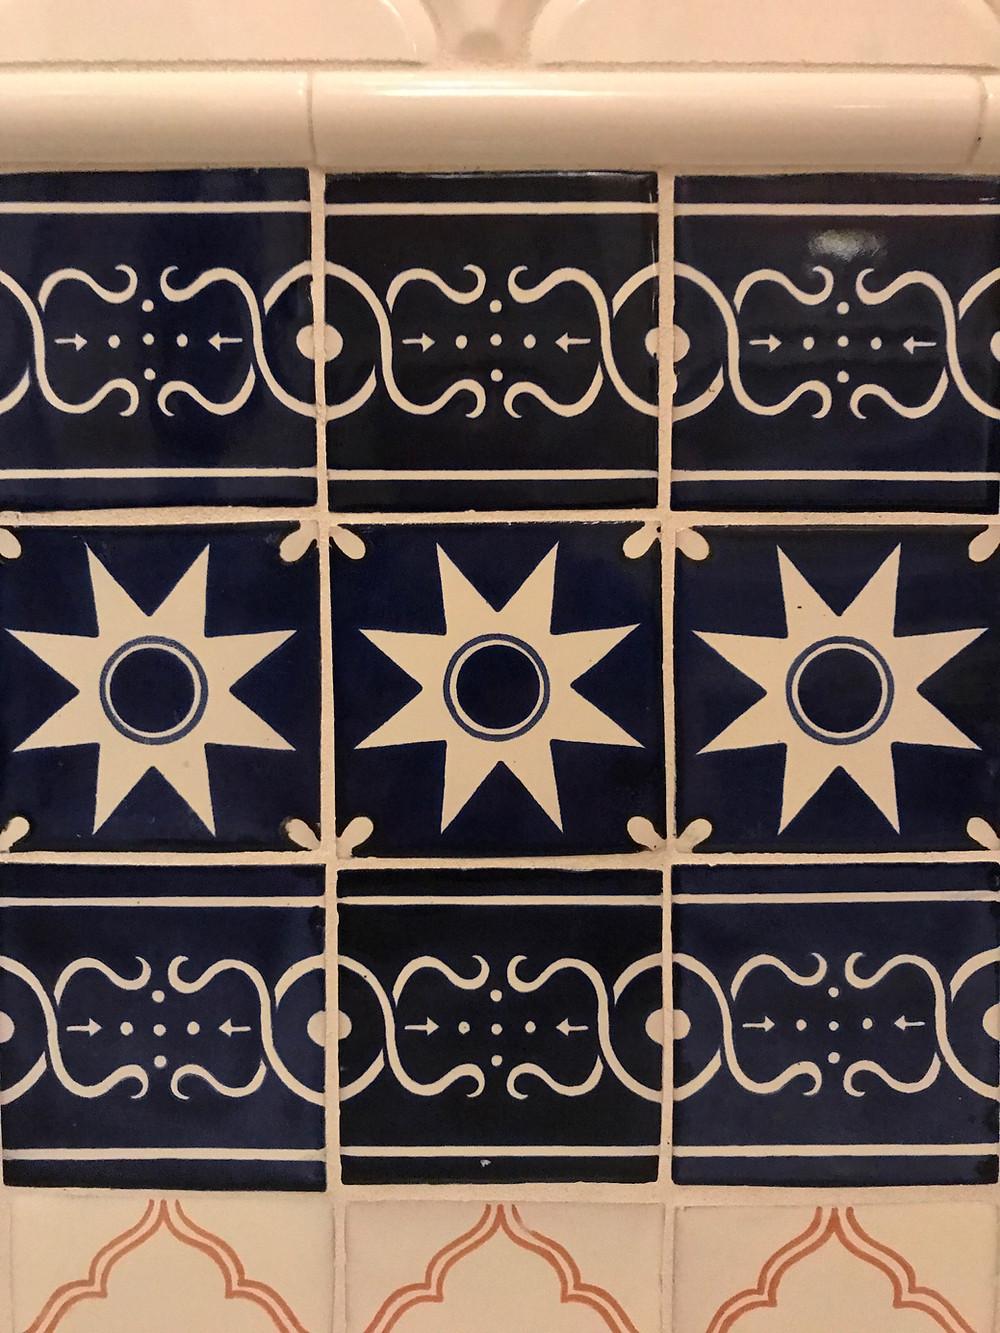 Wall Tile, Skipper Canteen Loo